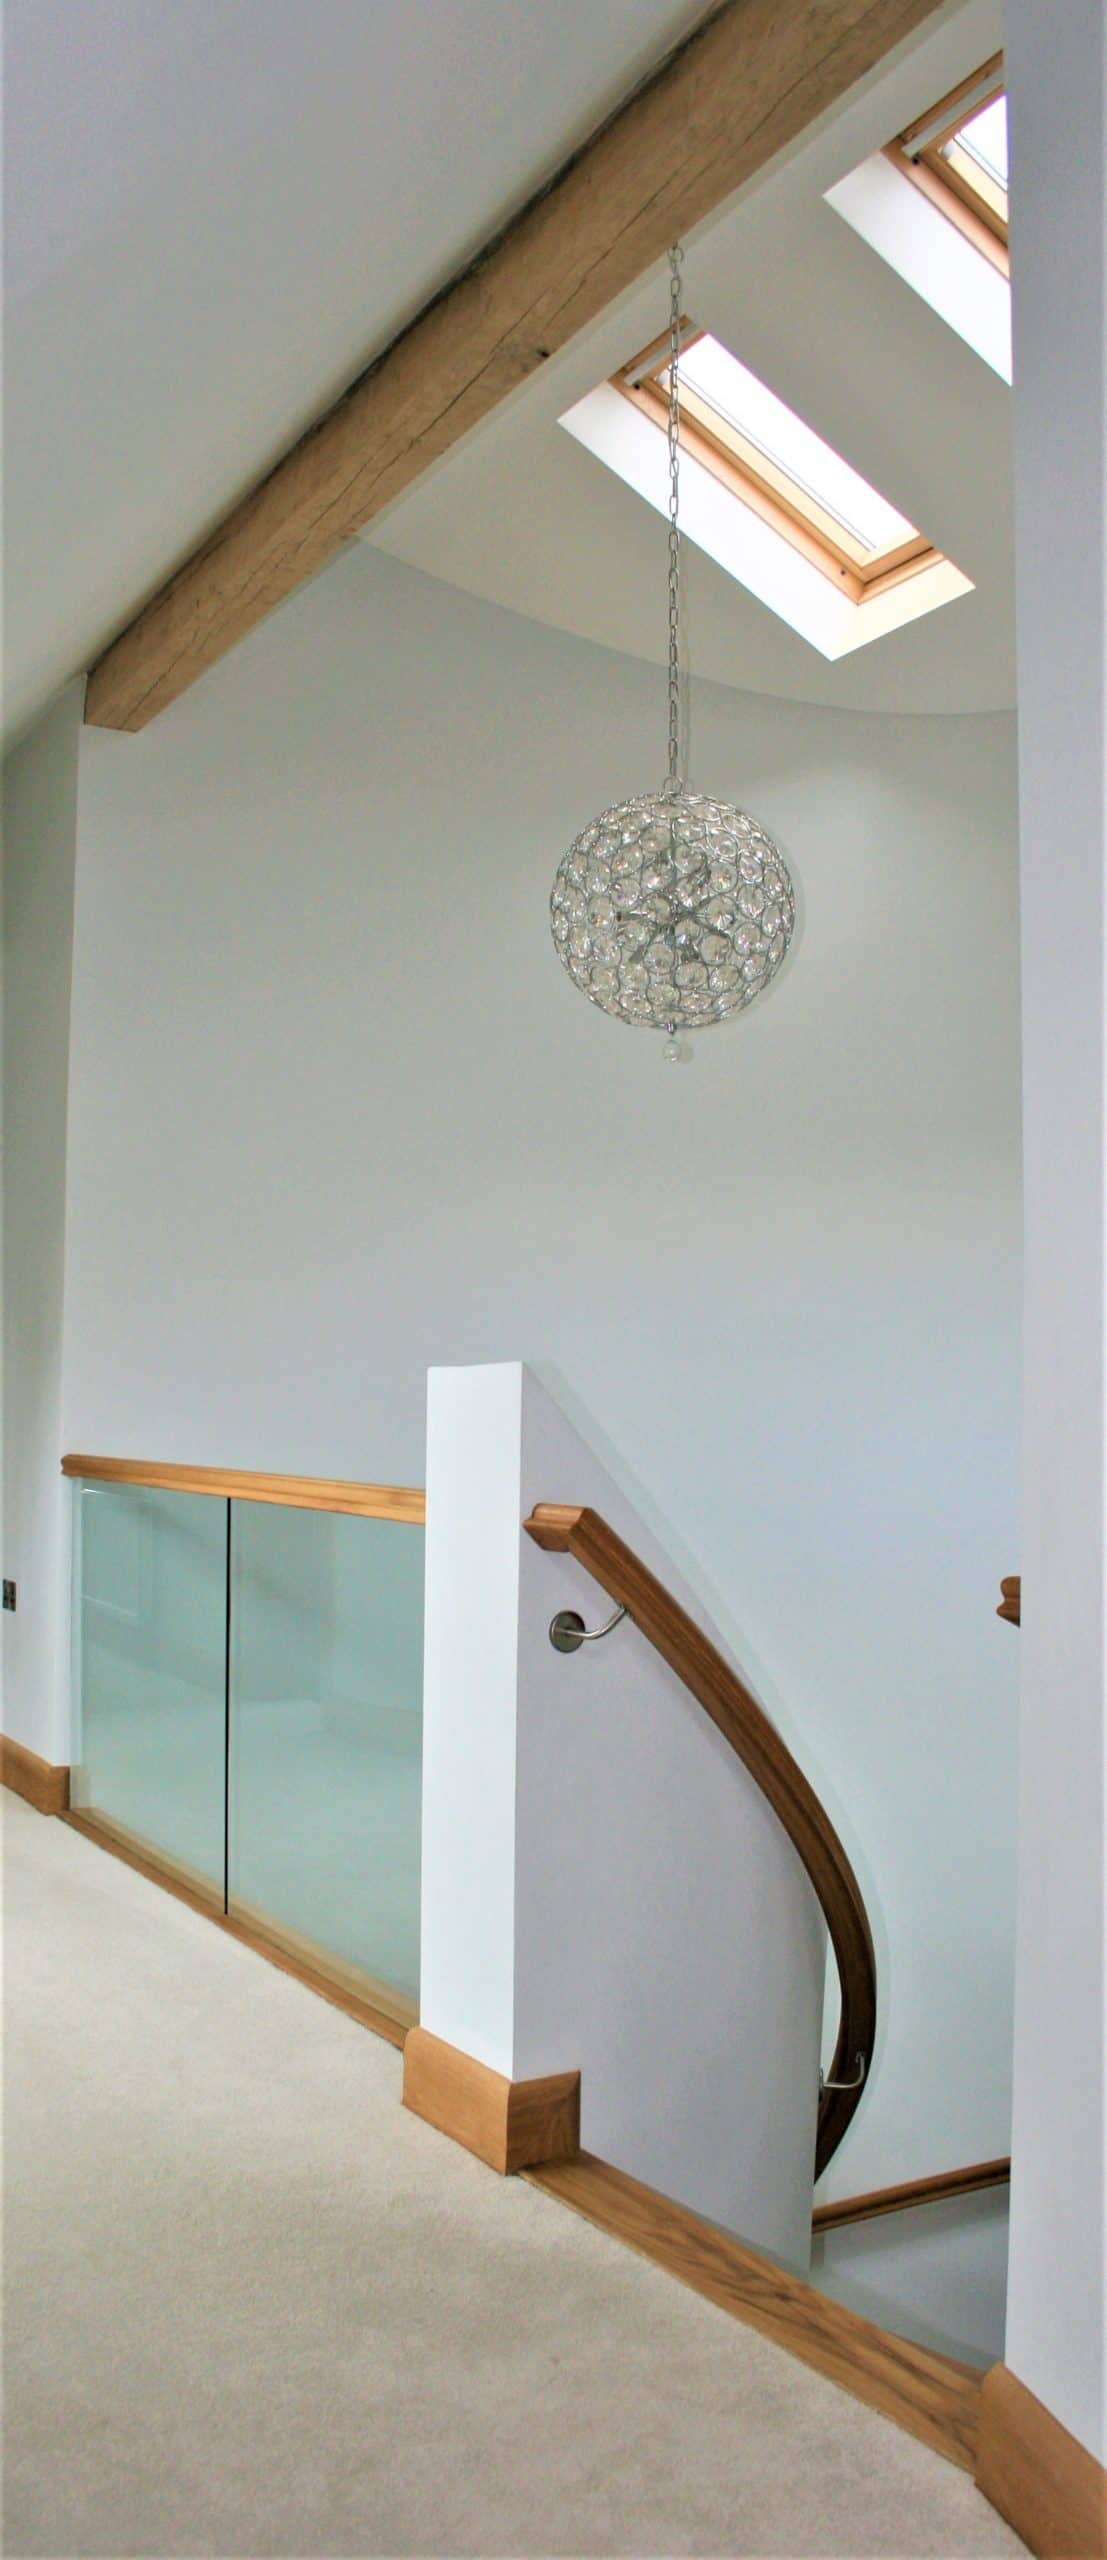 Killmartin - Top of Stairs